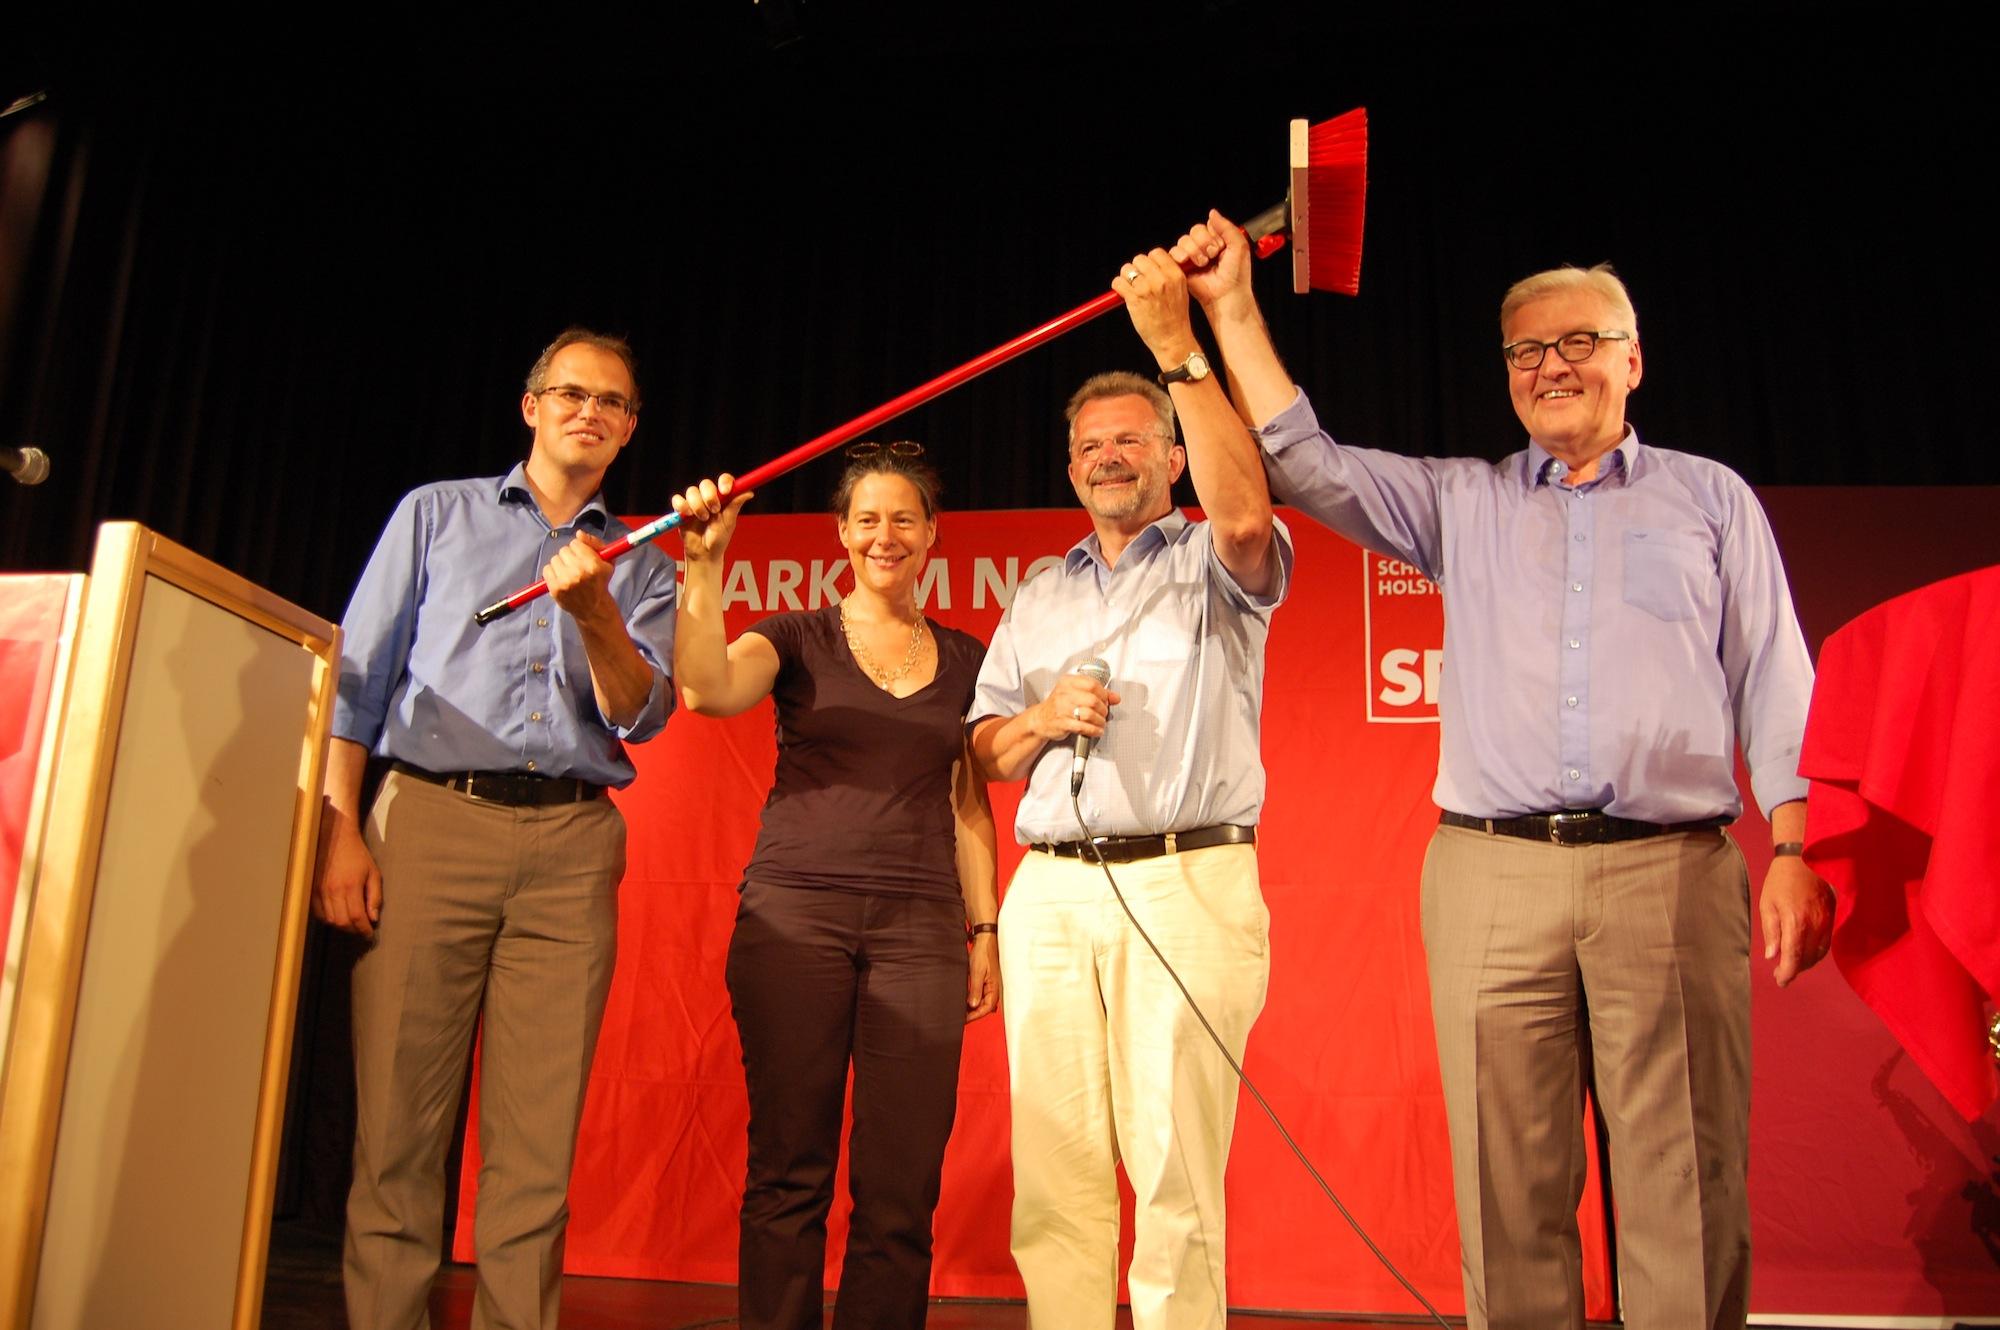 v.l.n.r.: Christian Carstensen, Nina Scheer, Franz Thönnes, Frank-Walter Steinmeier